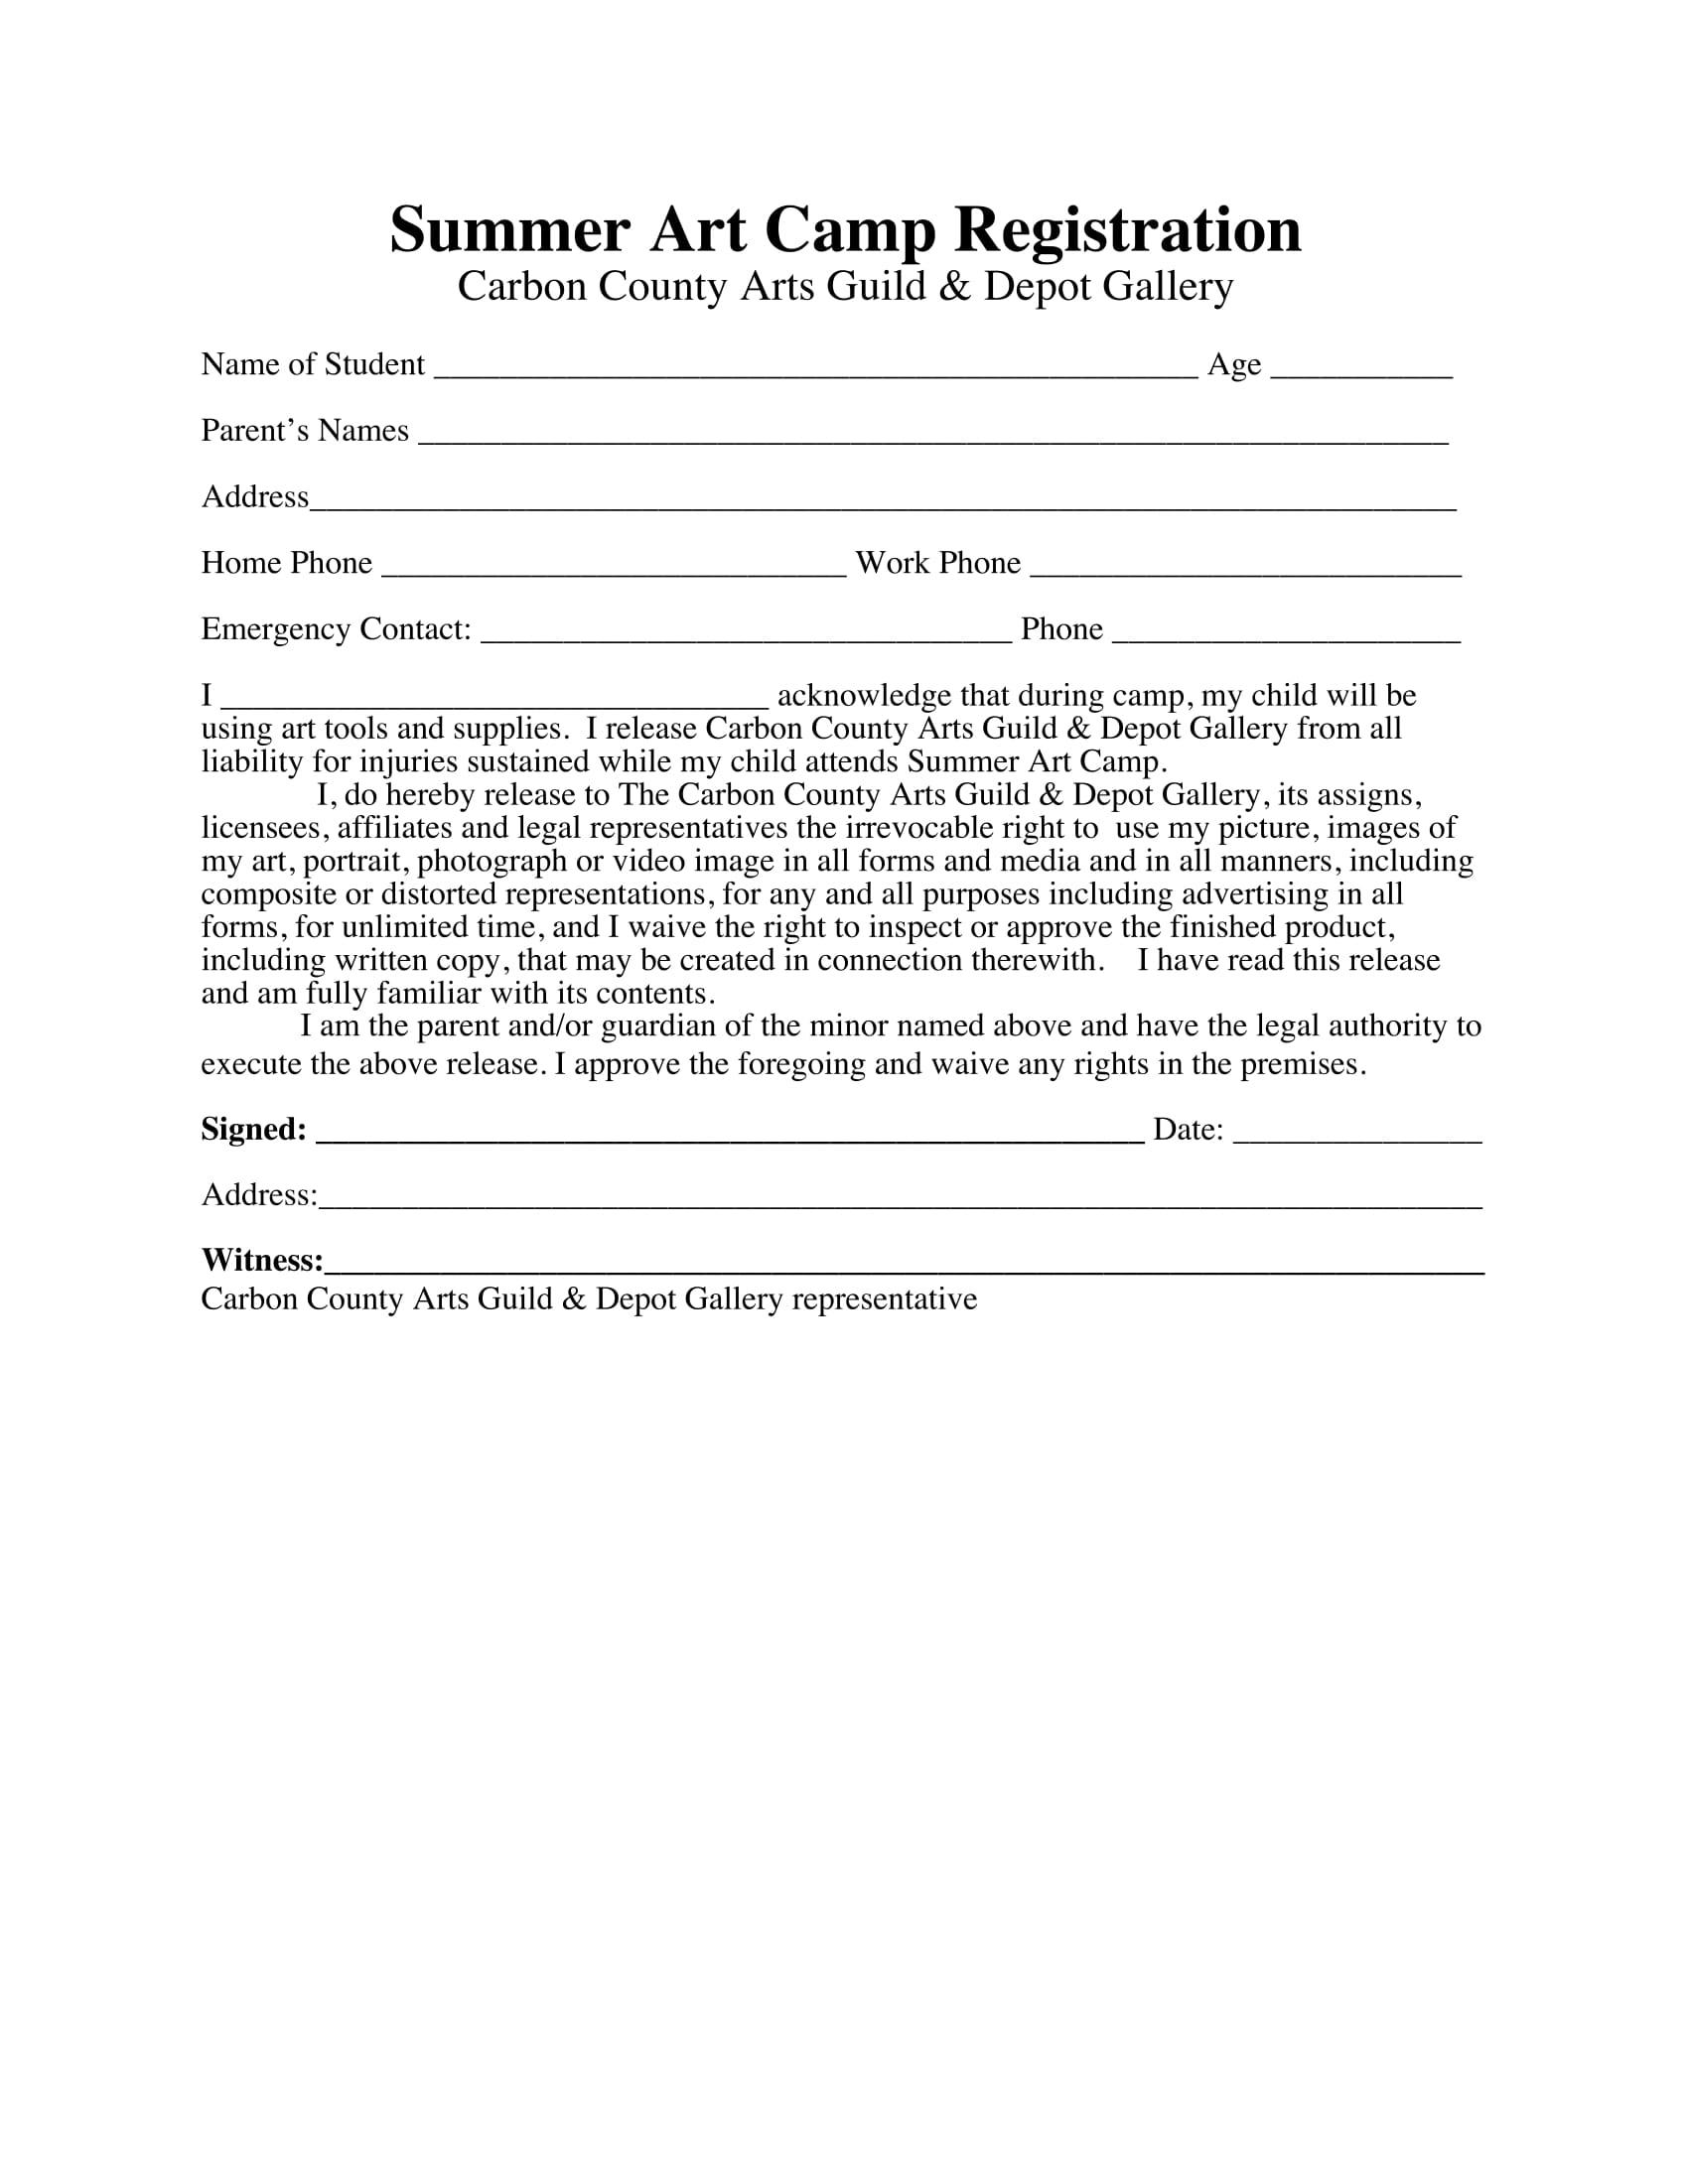 summer art camp registration form example 1